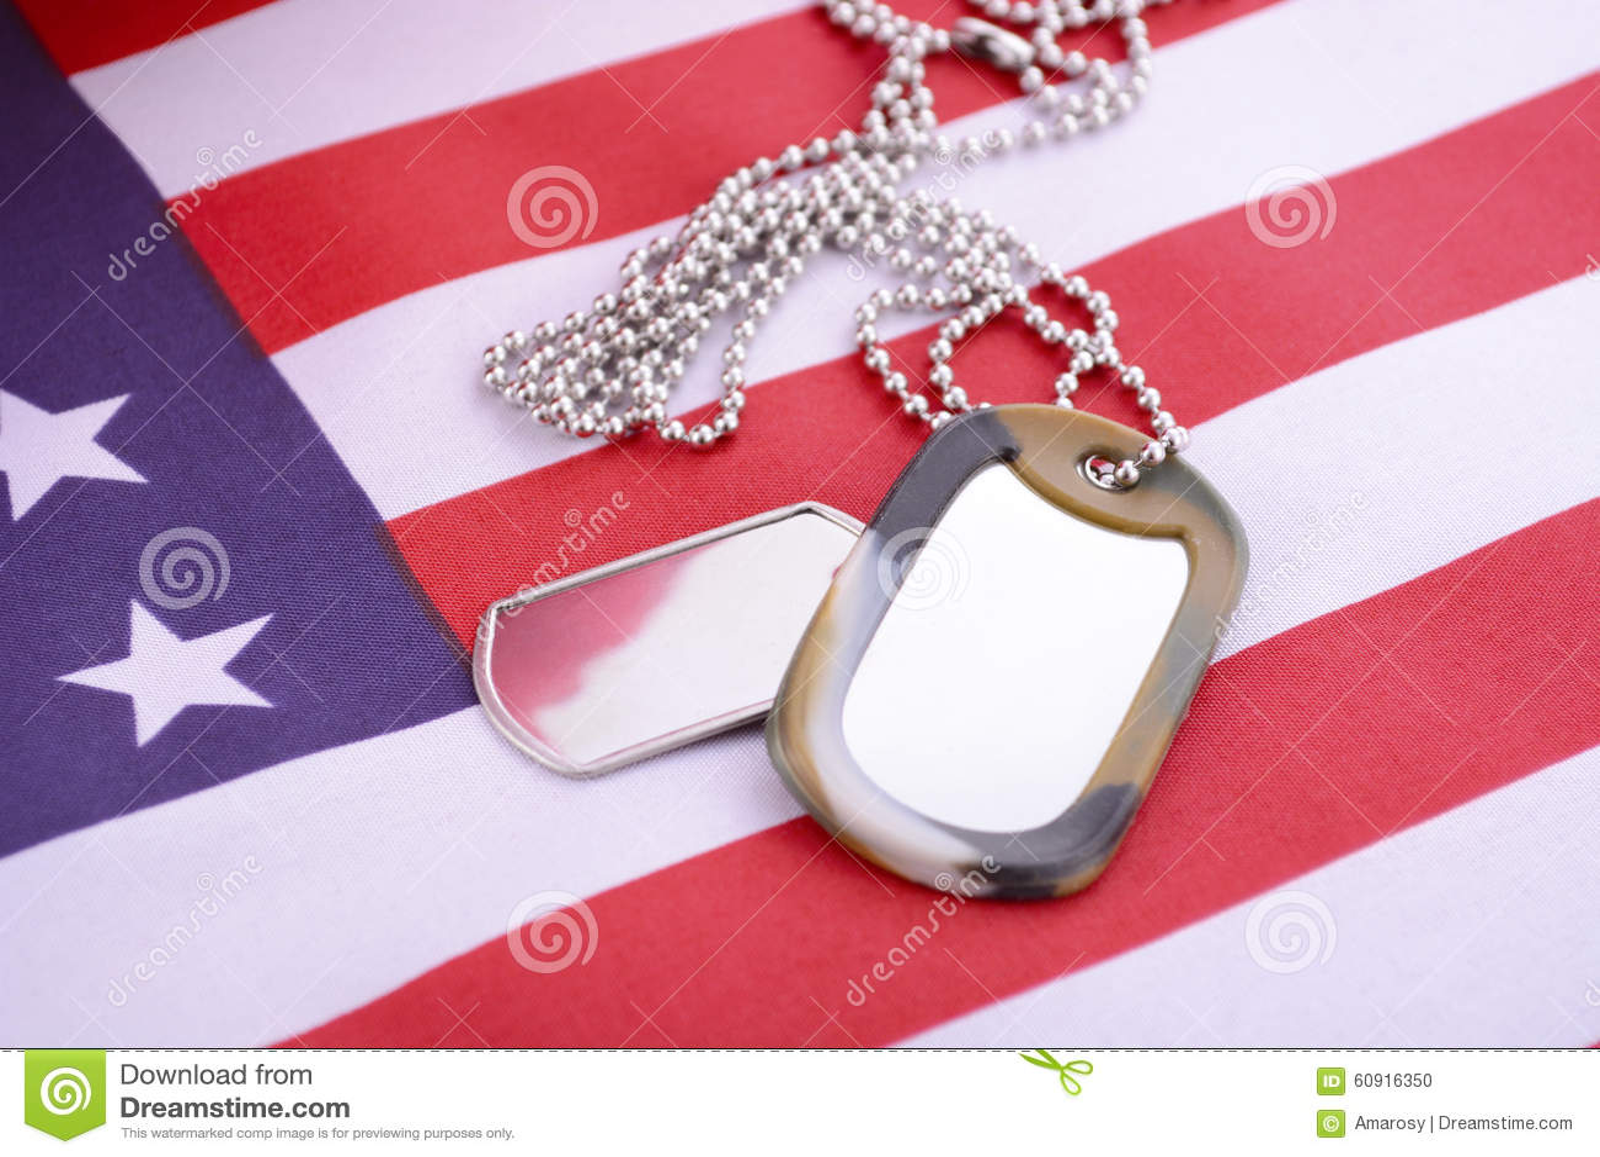 Do Navy Seals Wear Black Dog Tags